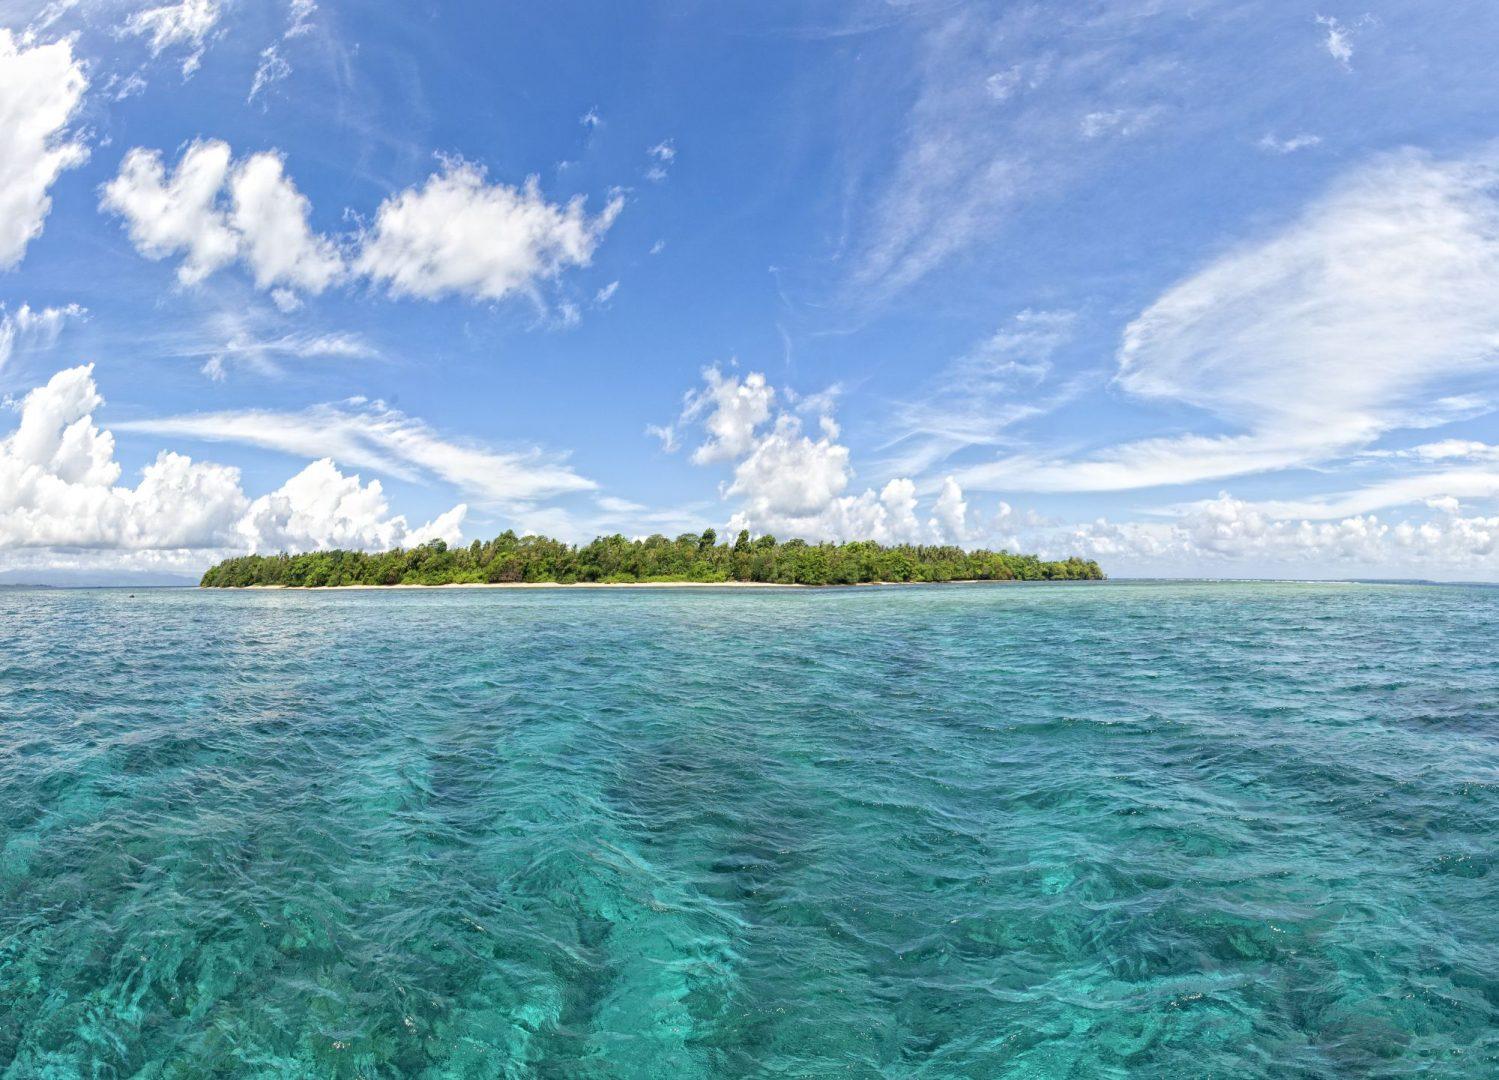 Siladen Island, Manado, Indonesia